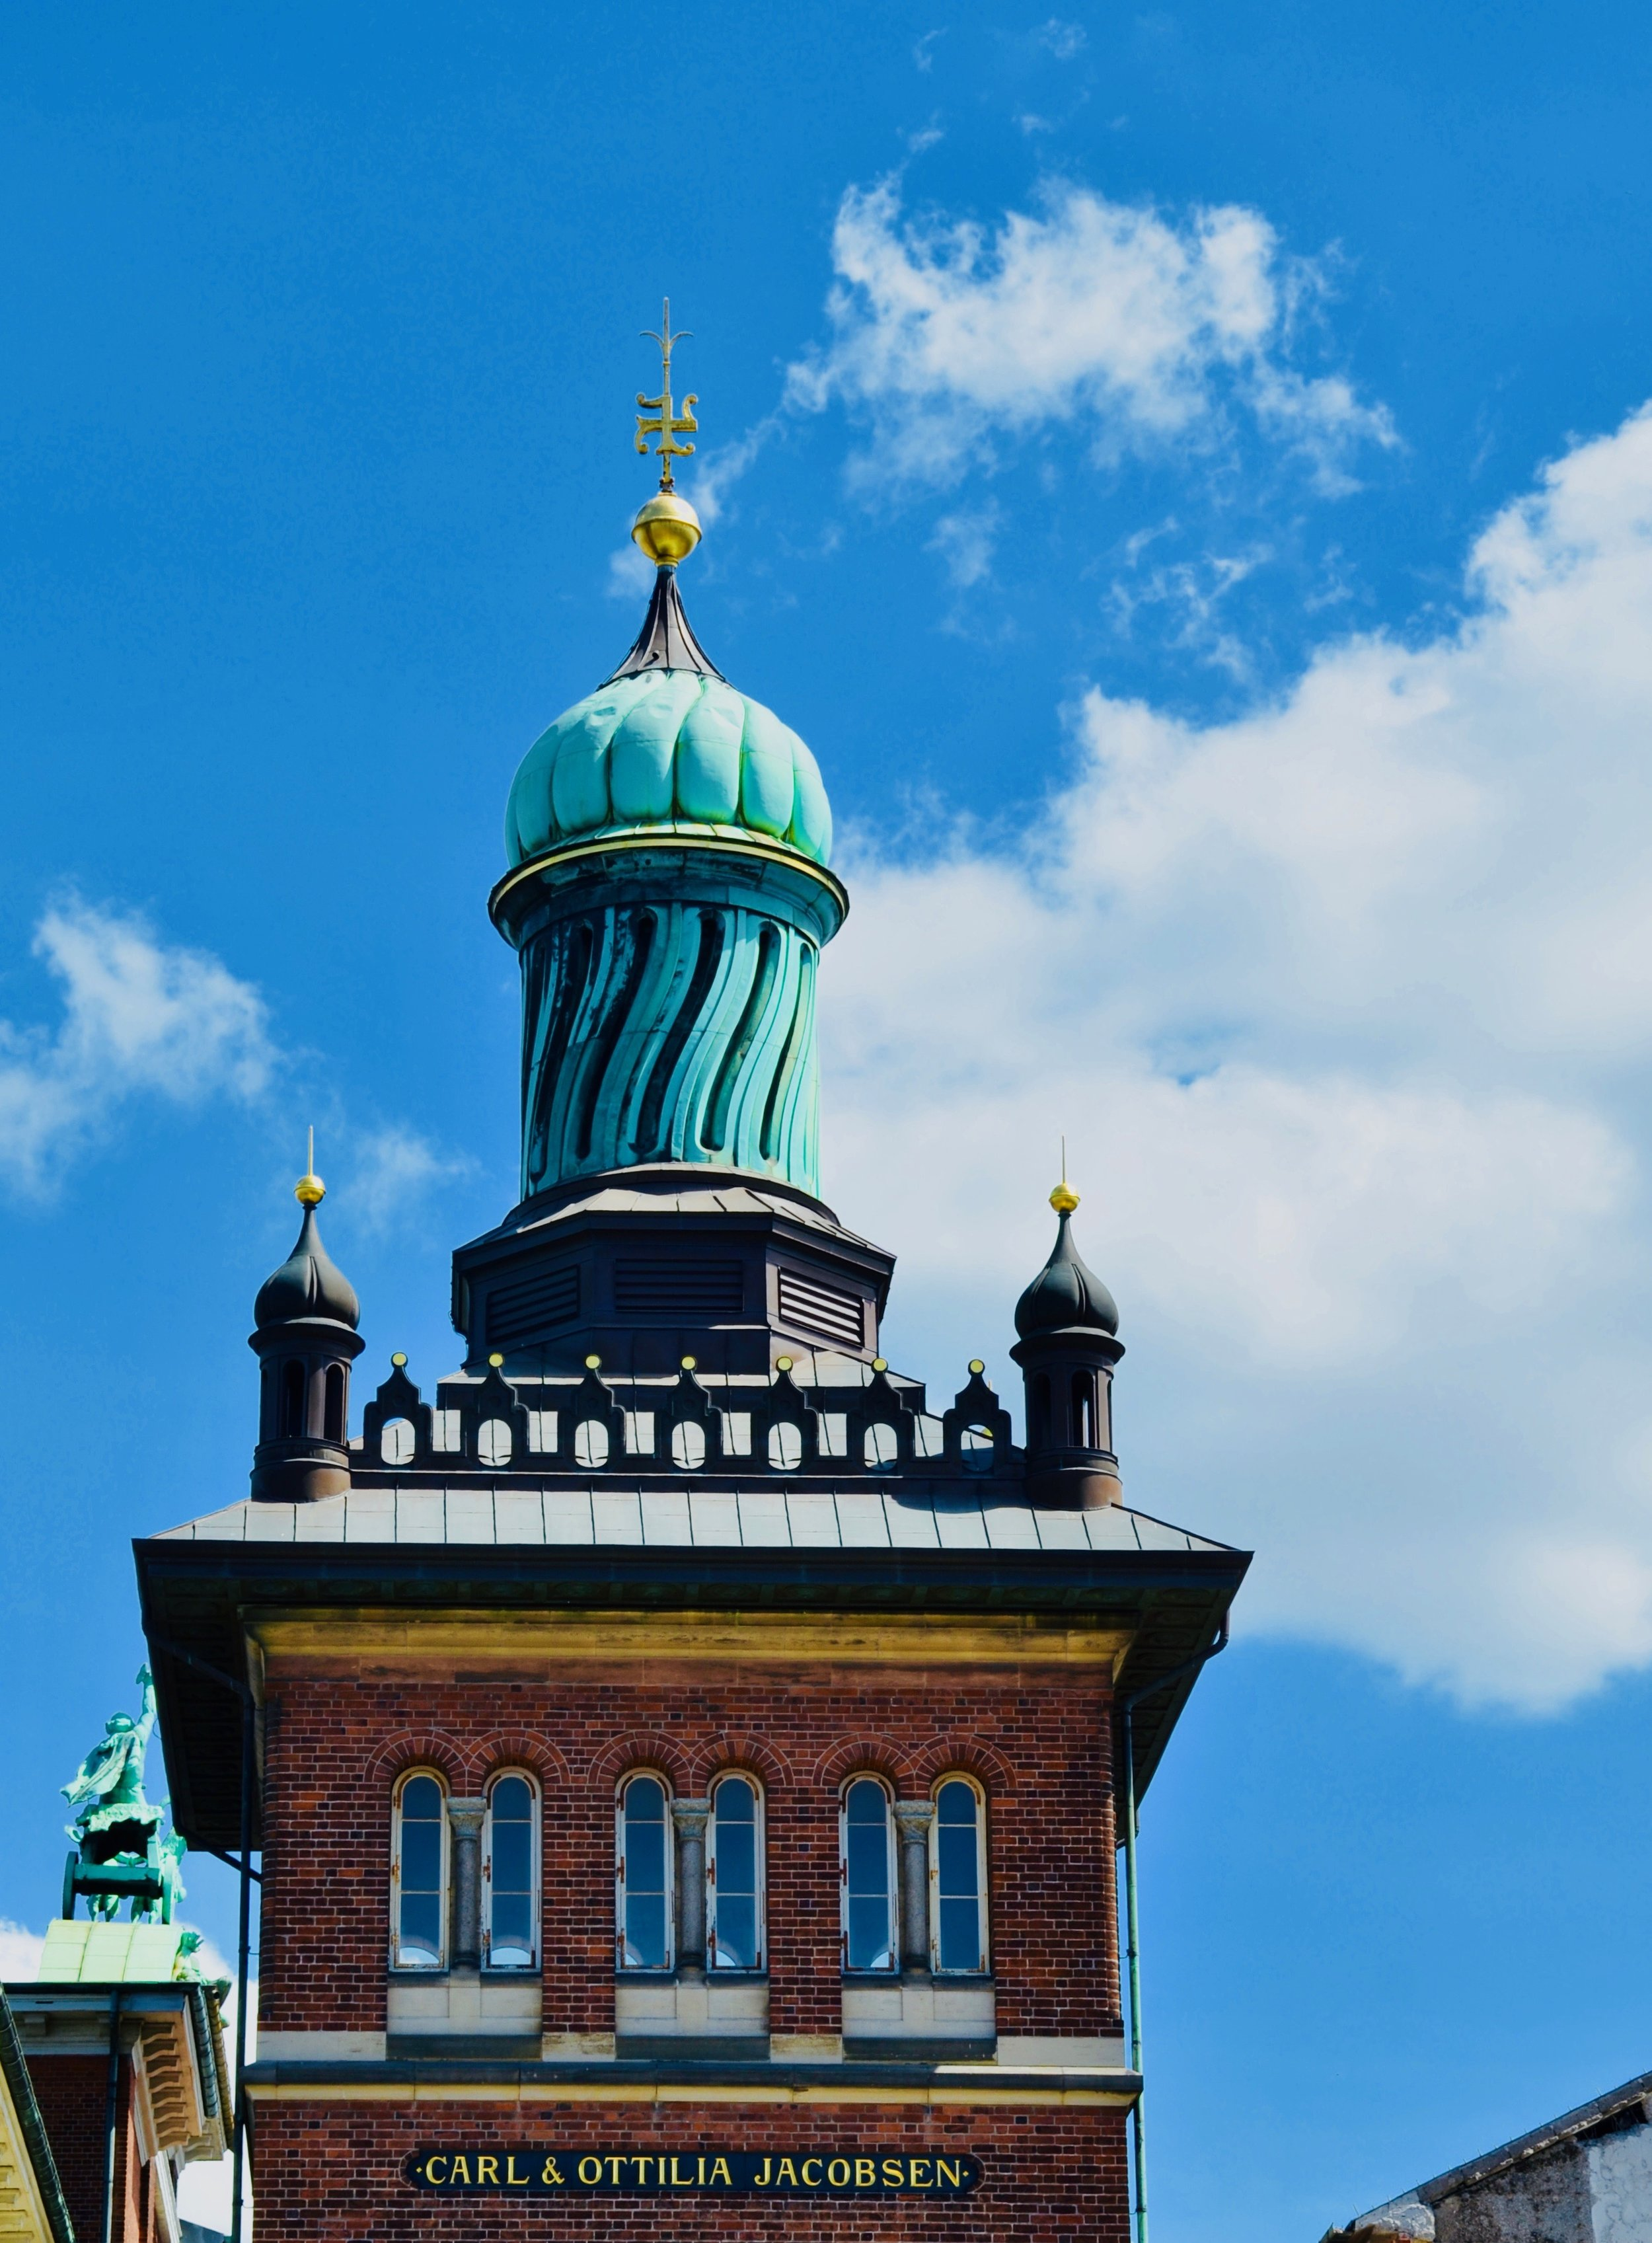 The Carlsberg tower, Copenhagen.